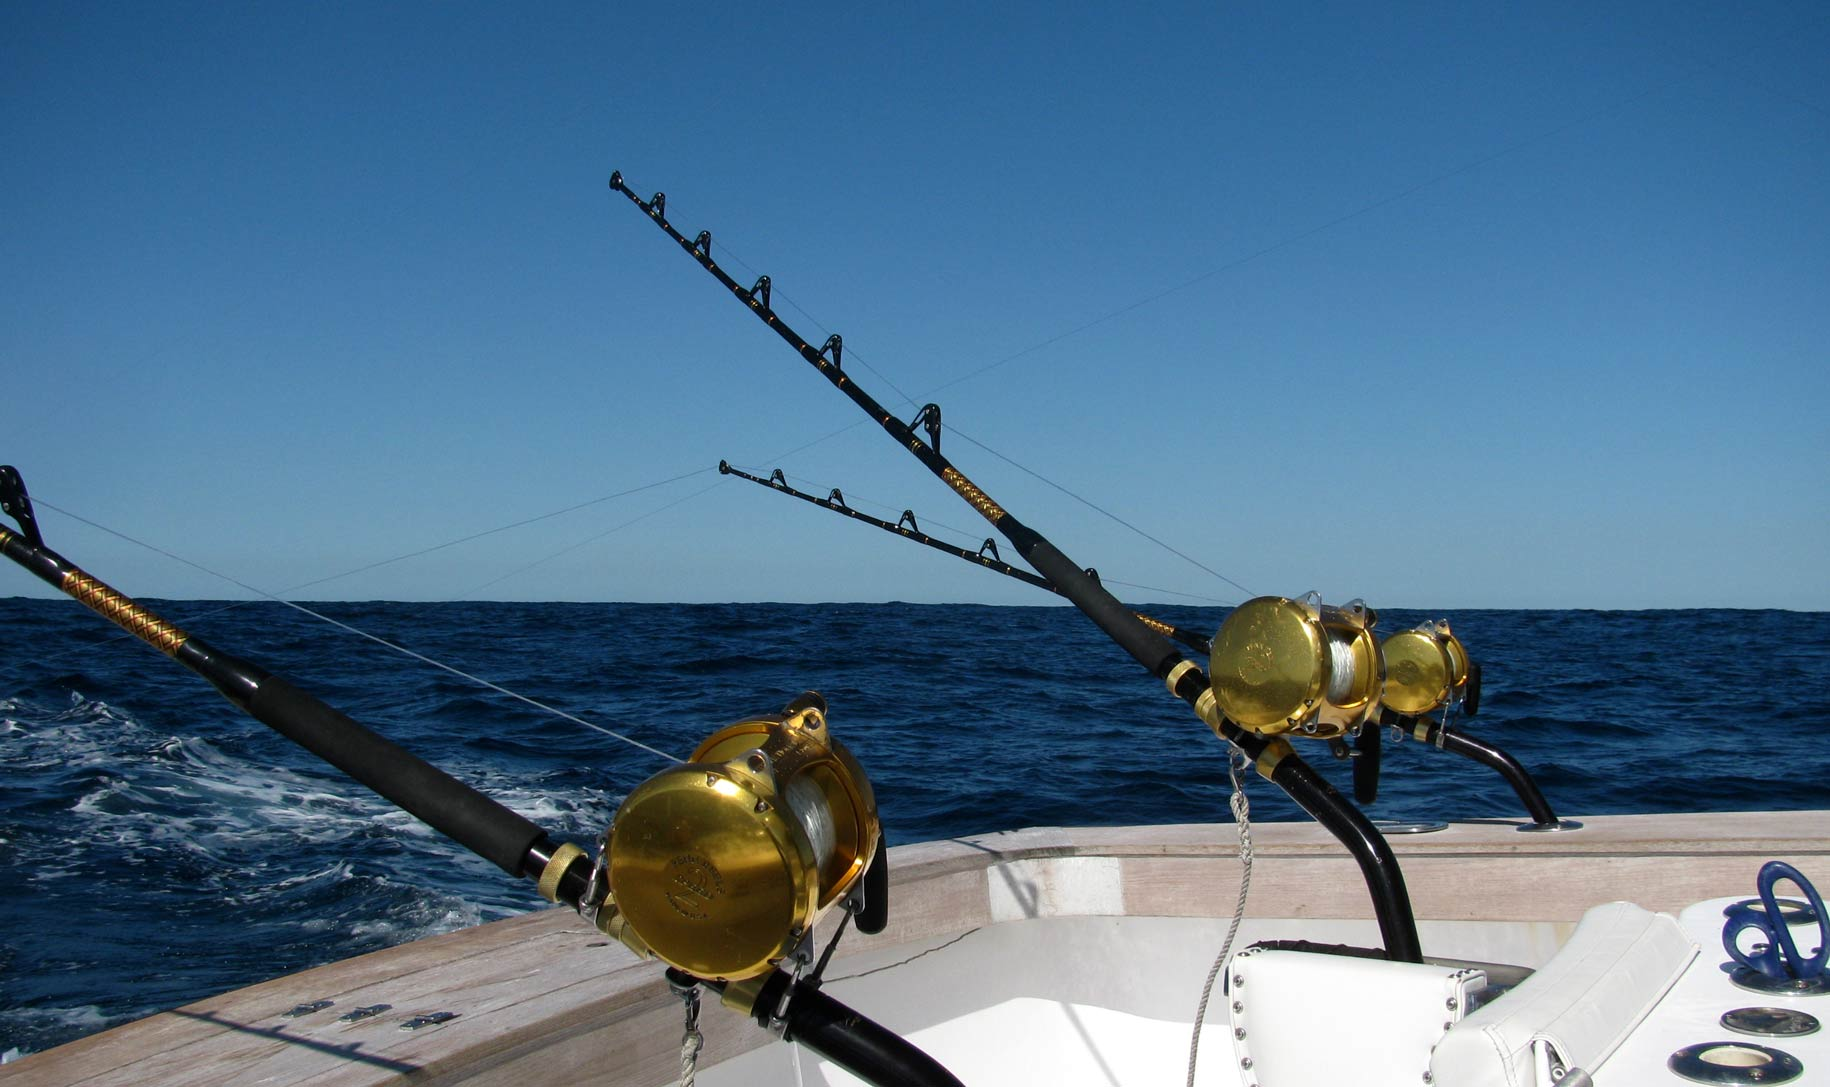 Big game mallorca trolling fishing mallorca best for Game fish